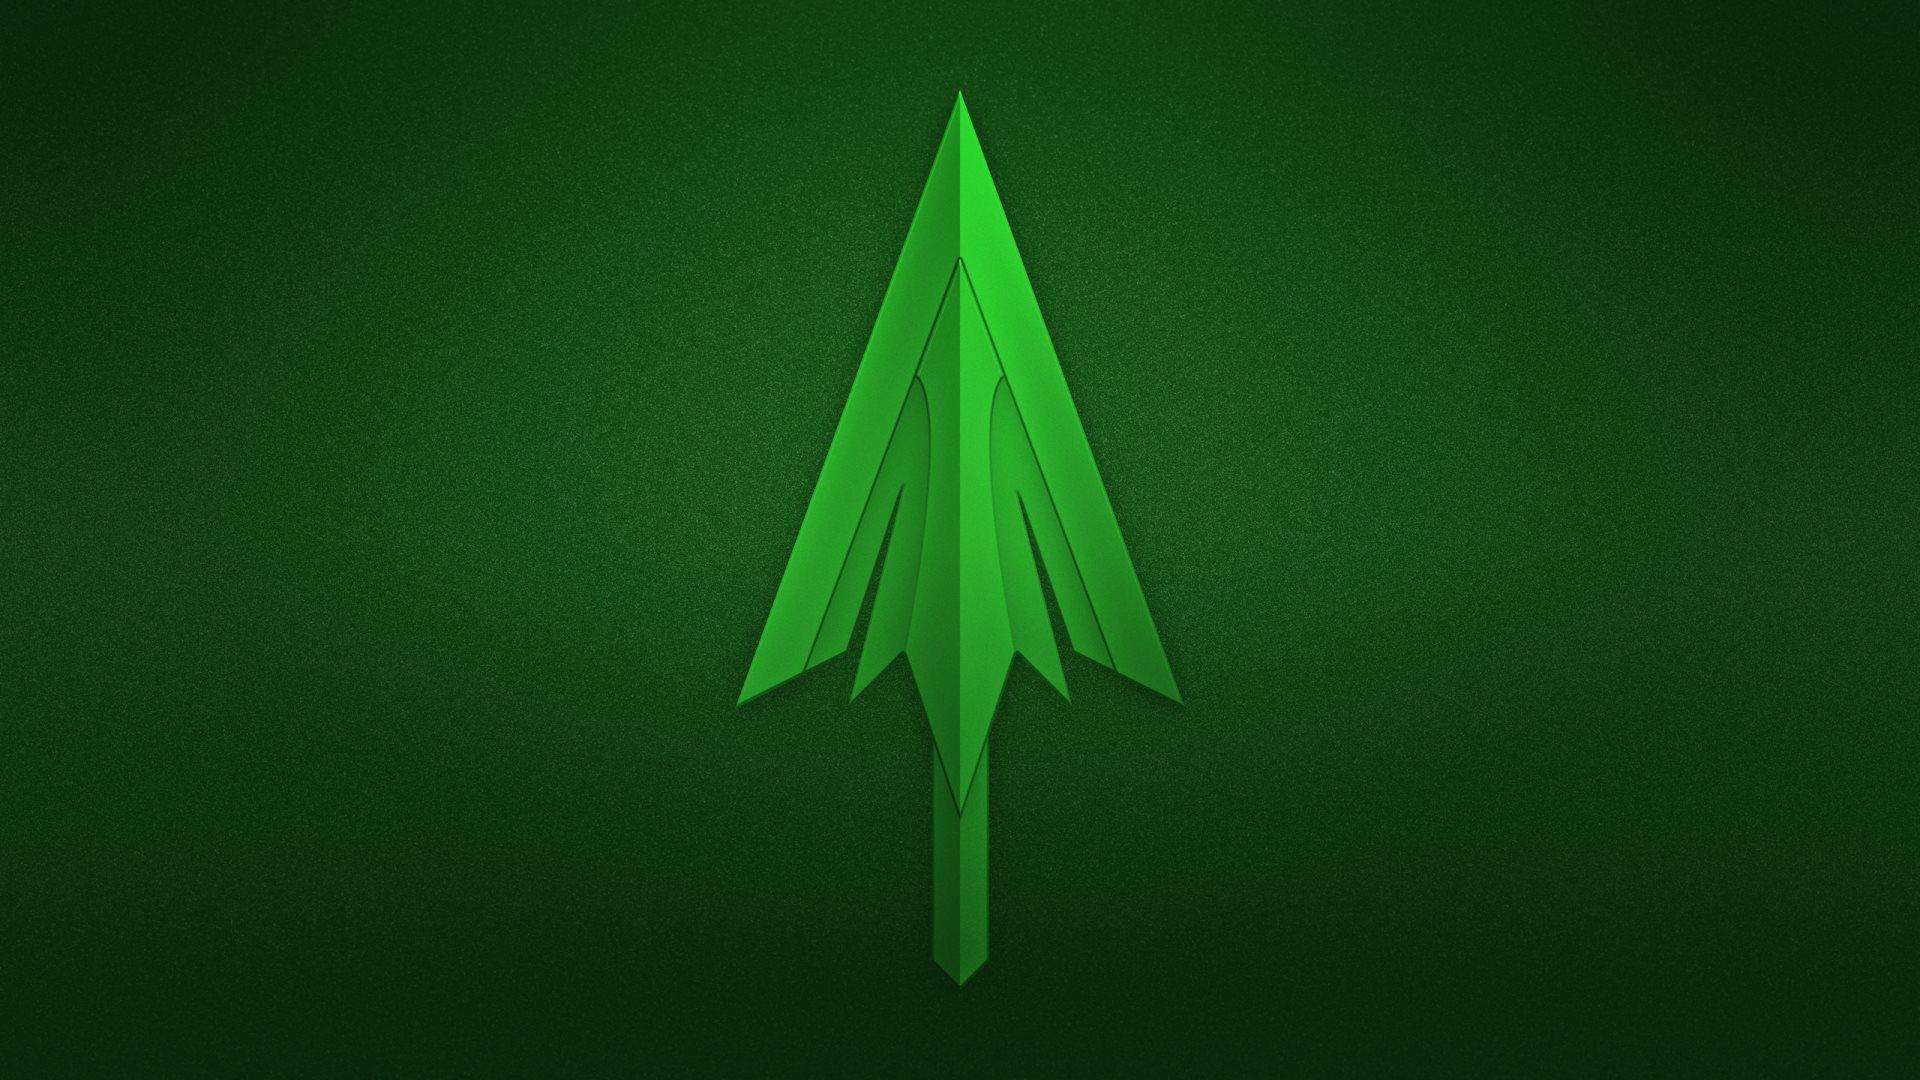 Green Arrow Logo Wallpaper 1920x1080